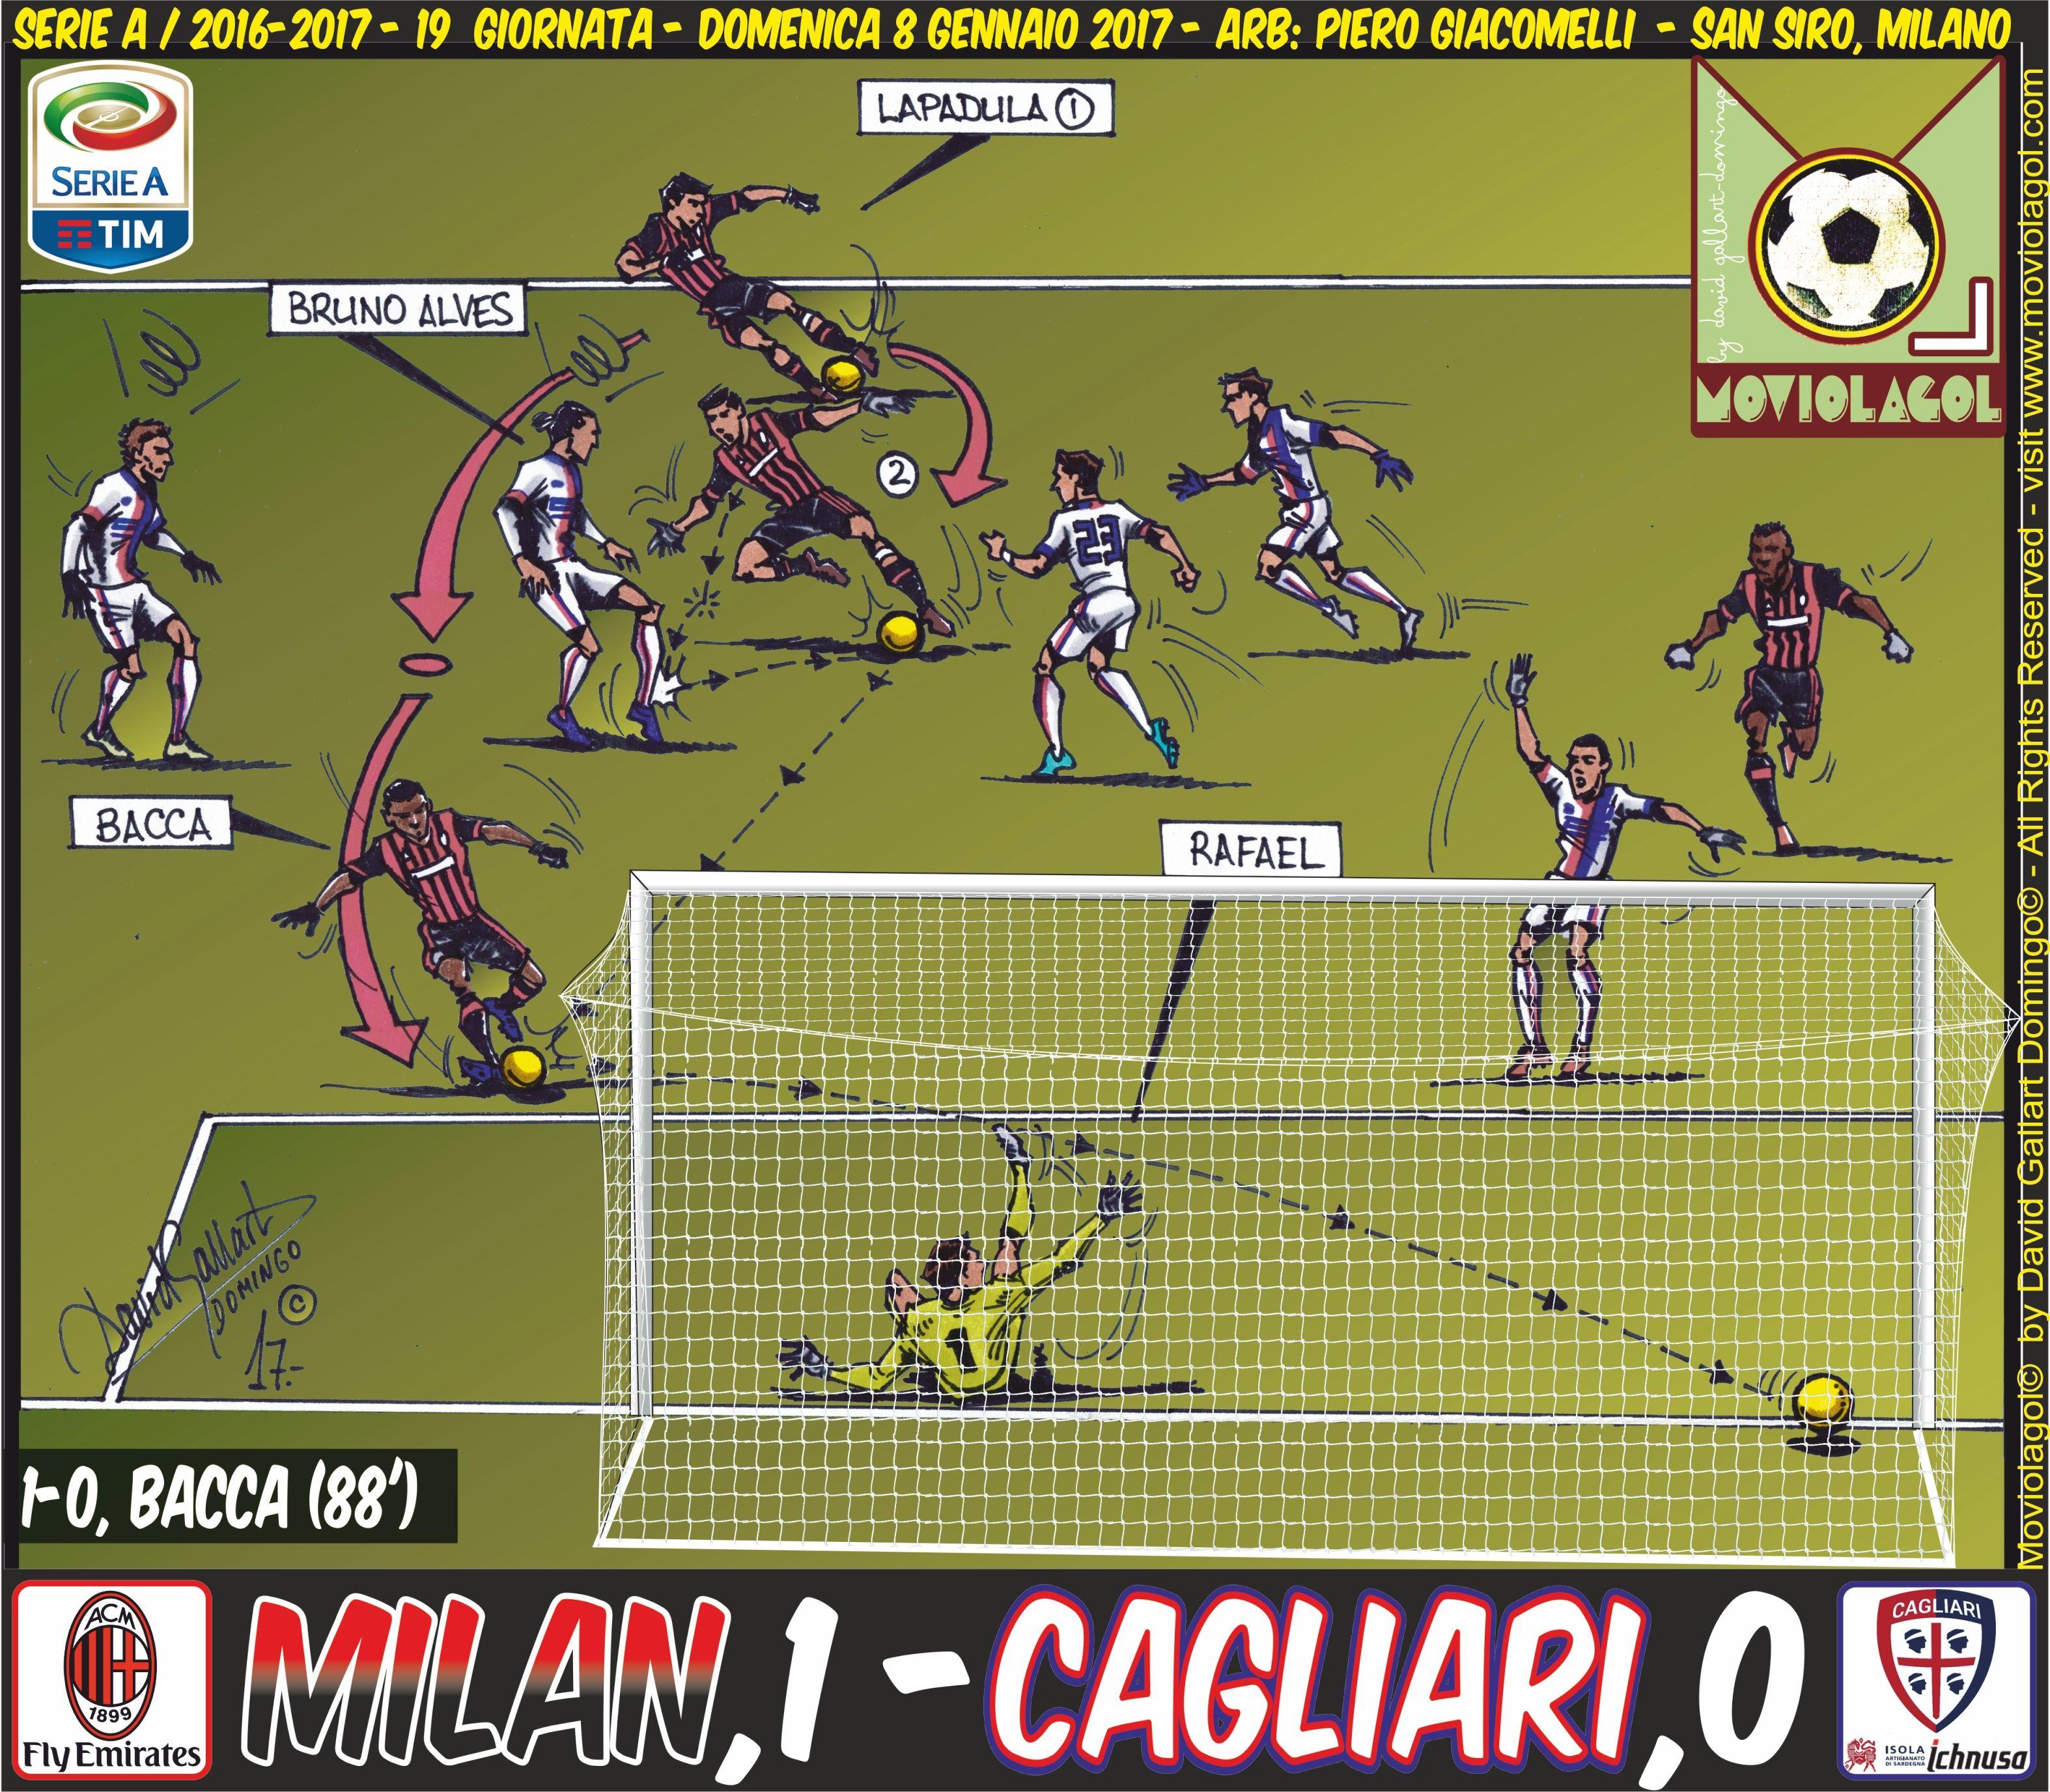 Moviolagol_by David Gallart Domingo_SERIE A_2016-2017_19G_Milan, 1 - Cagliari, 0